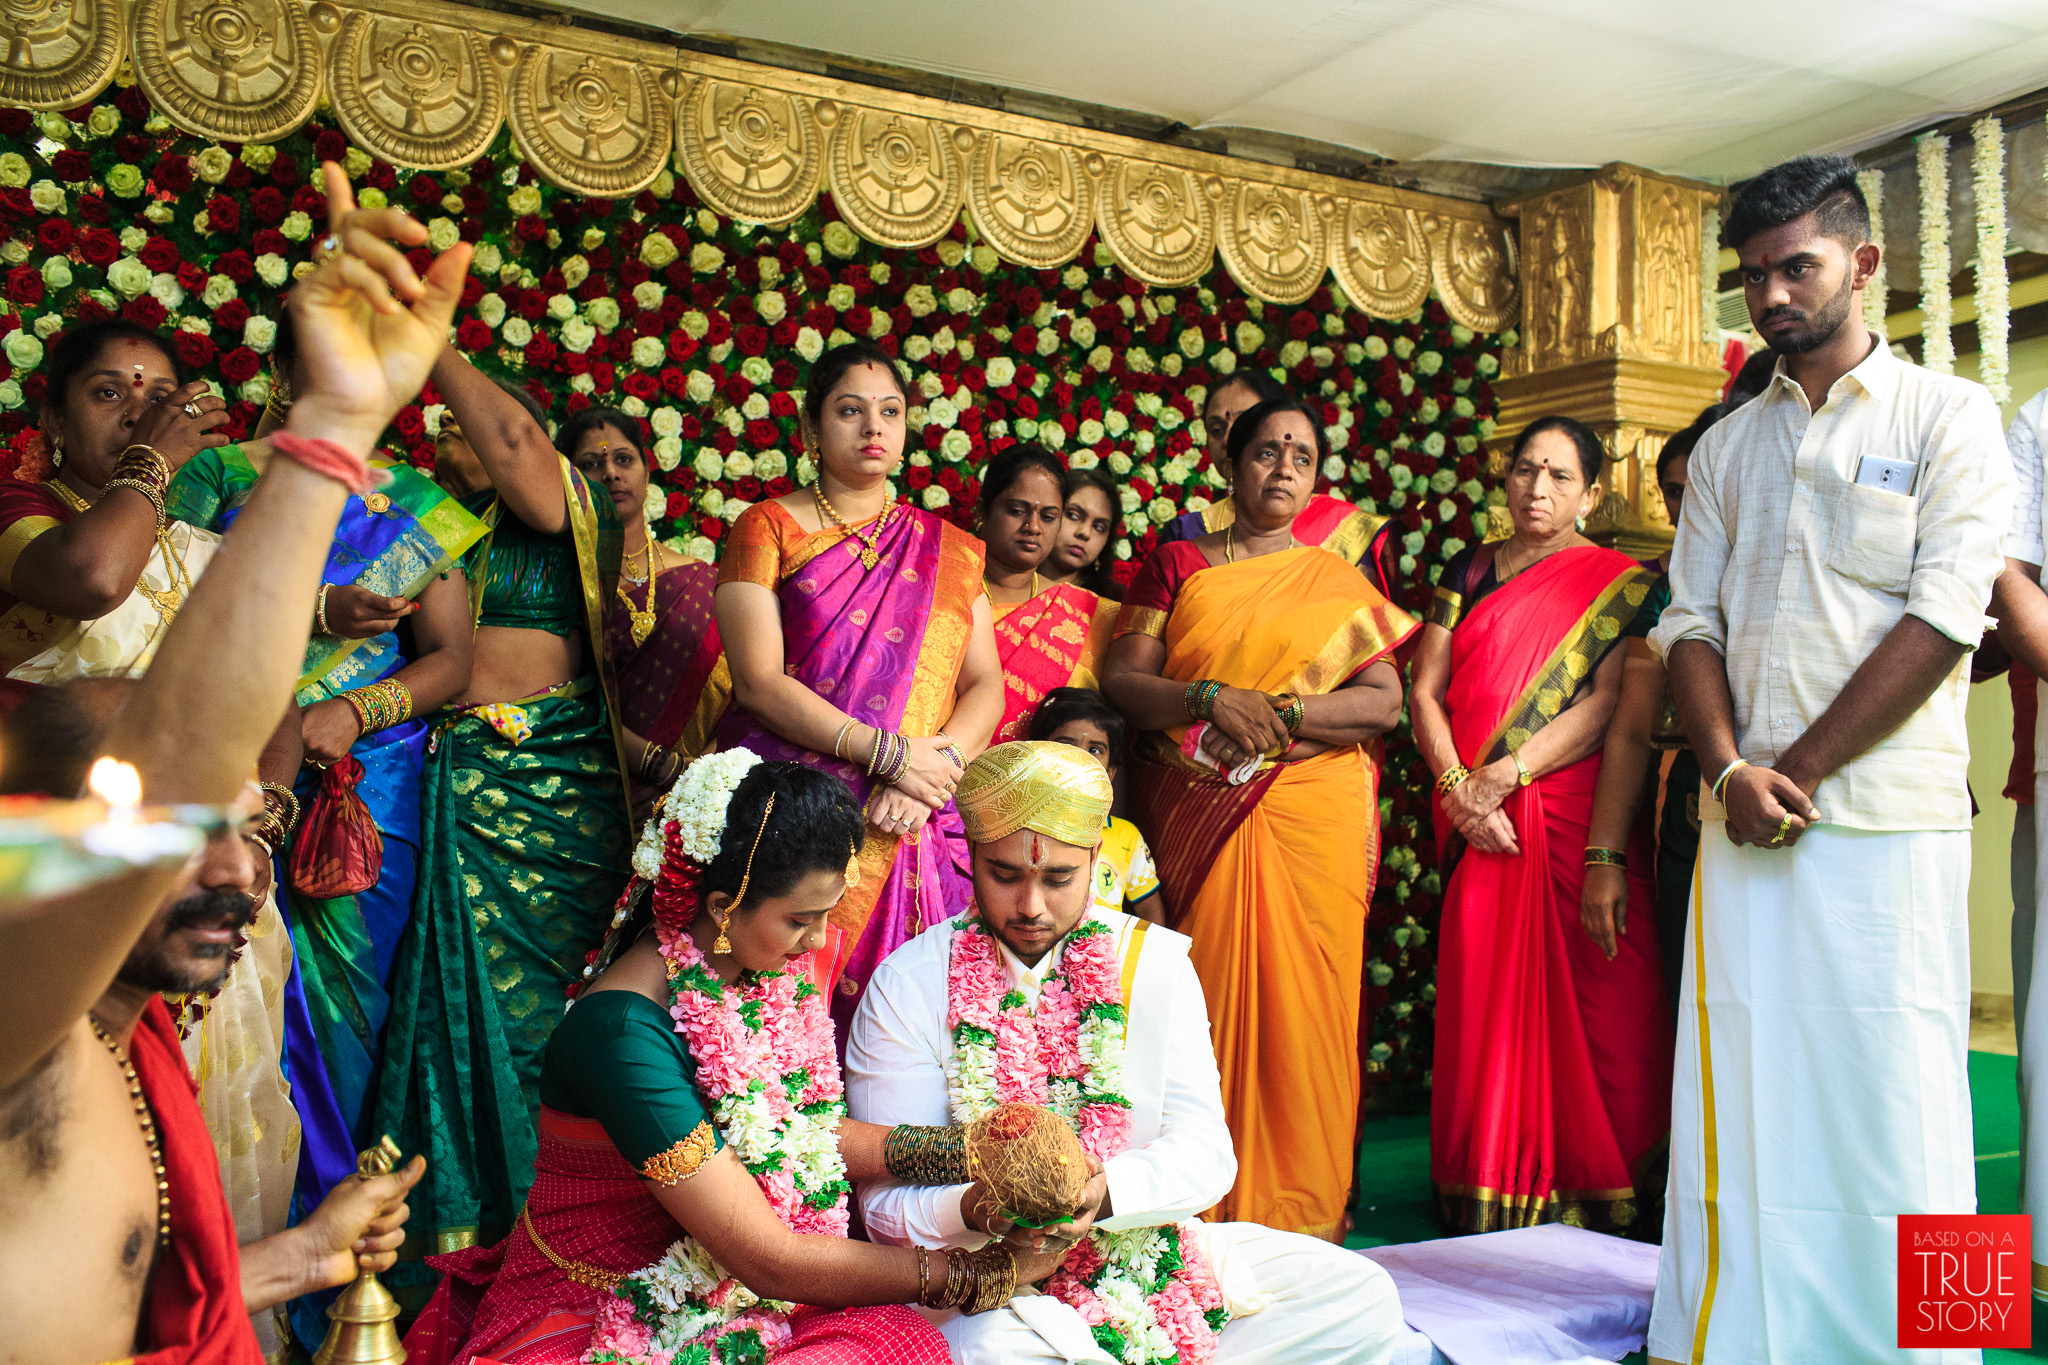 Tamil-Candid-Wedding-Photography-0067.jpg